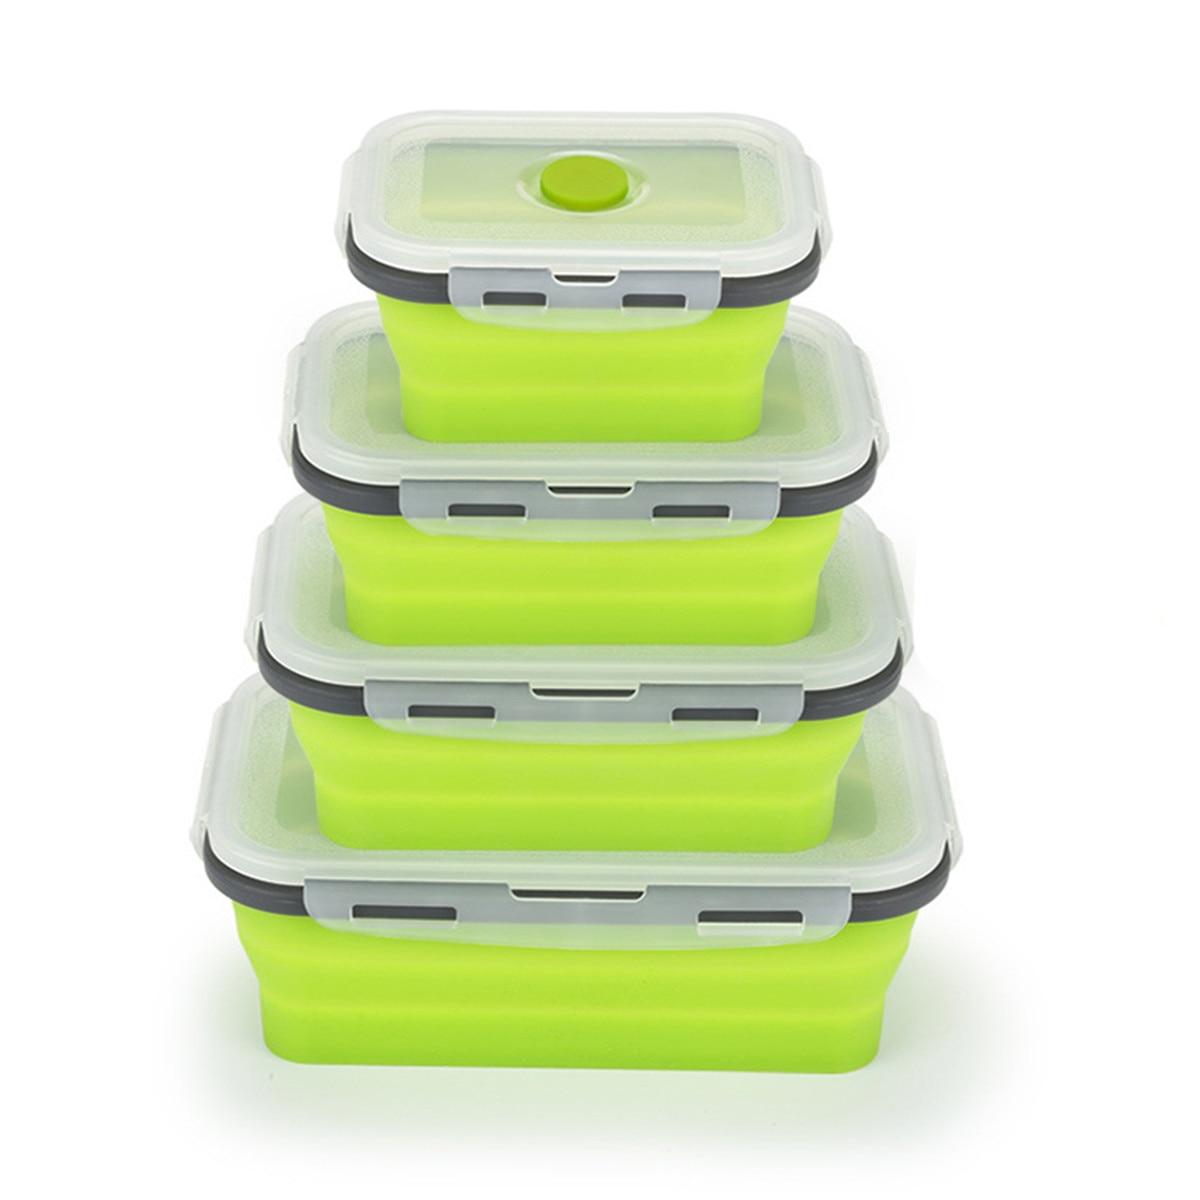 De silicona de moda portátil plegable caja de Bento plegable caja de almuerzo para alimentos vajilla/350/500/800/1200 ml